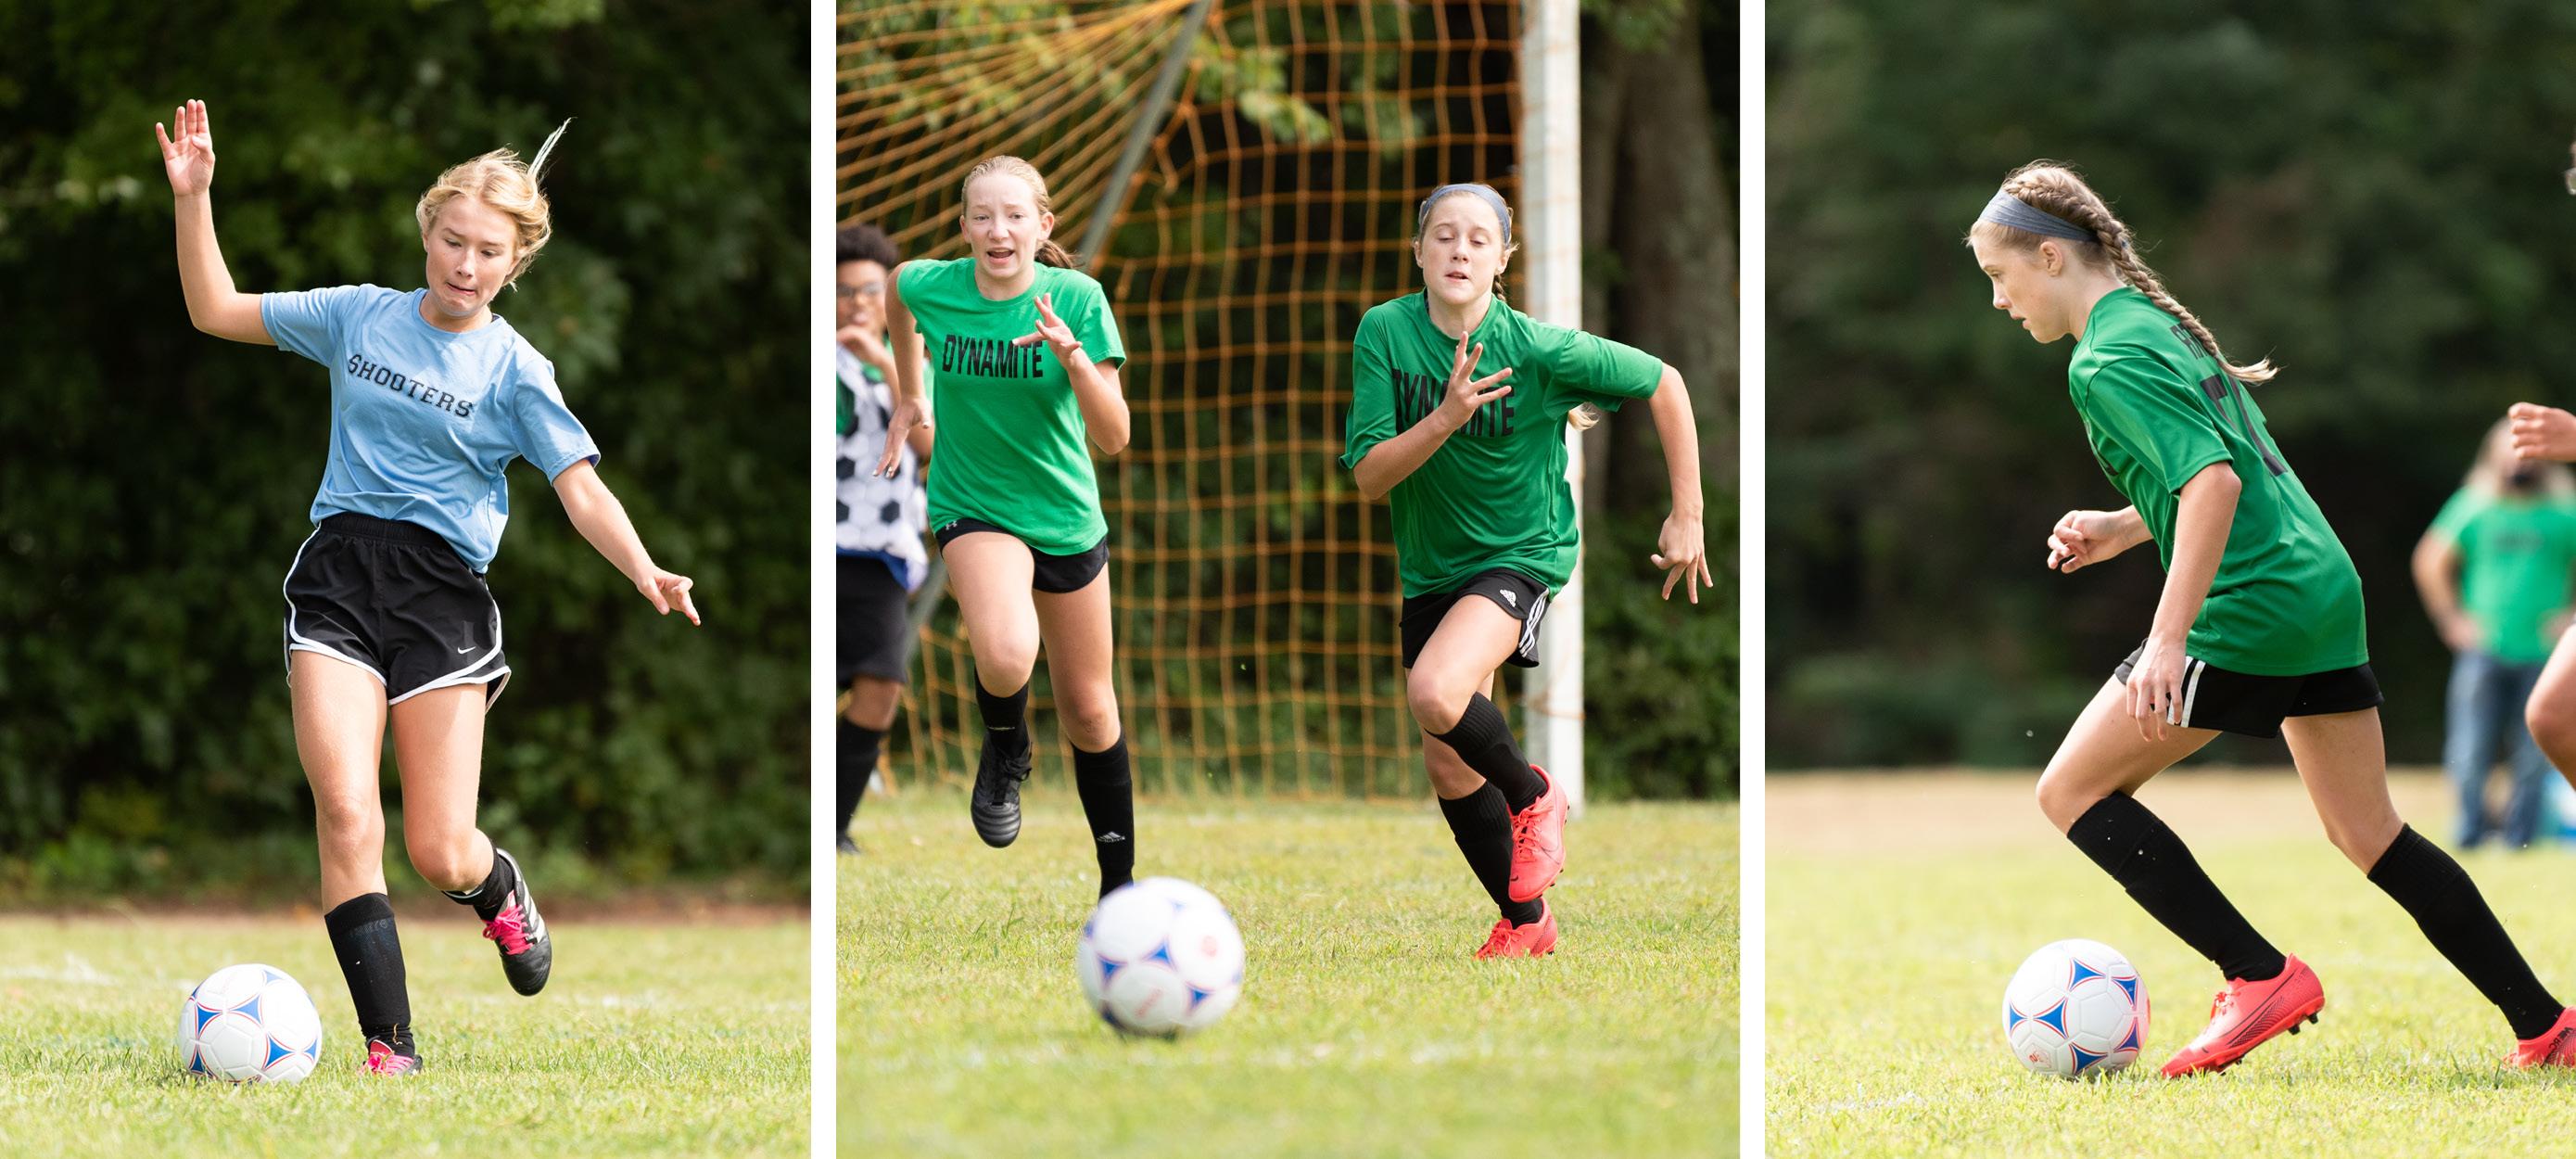 Soccer - Girls Spring Rec League